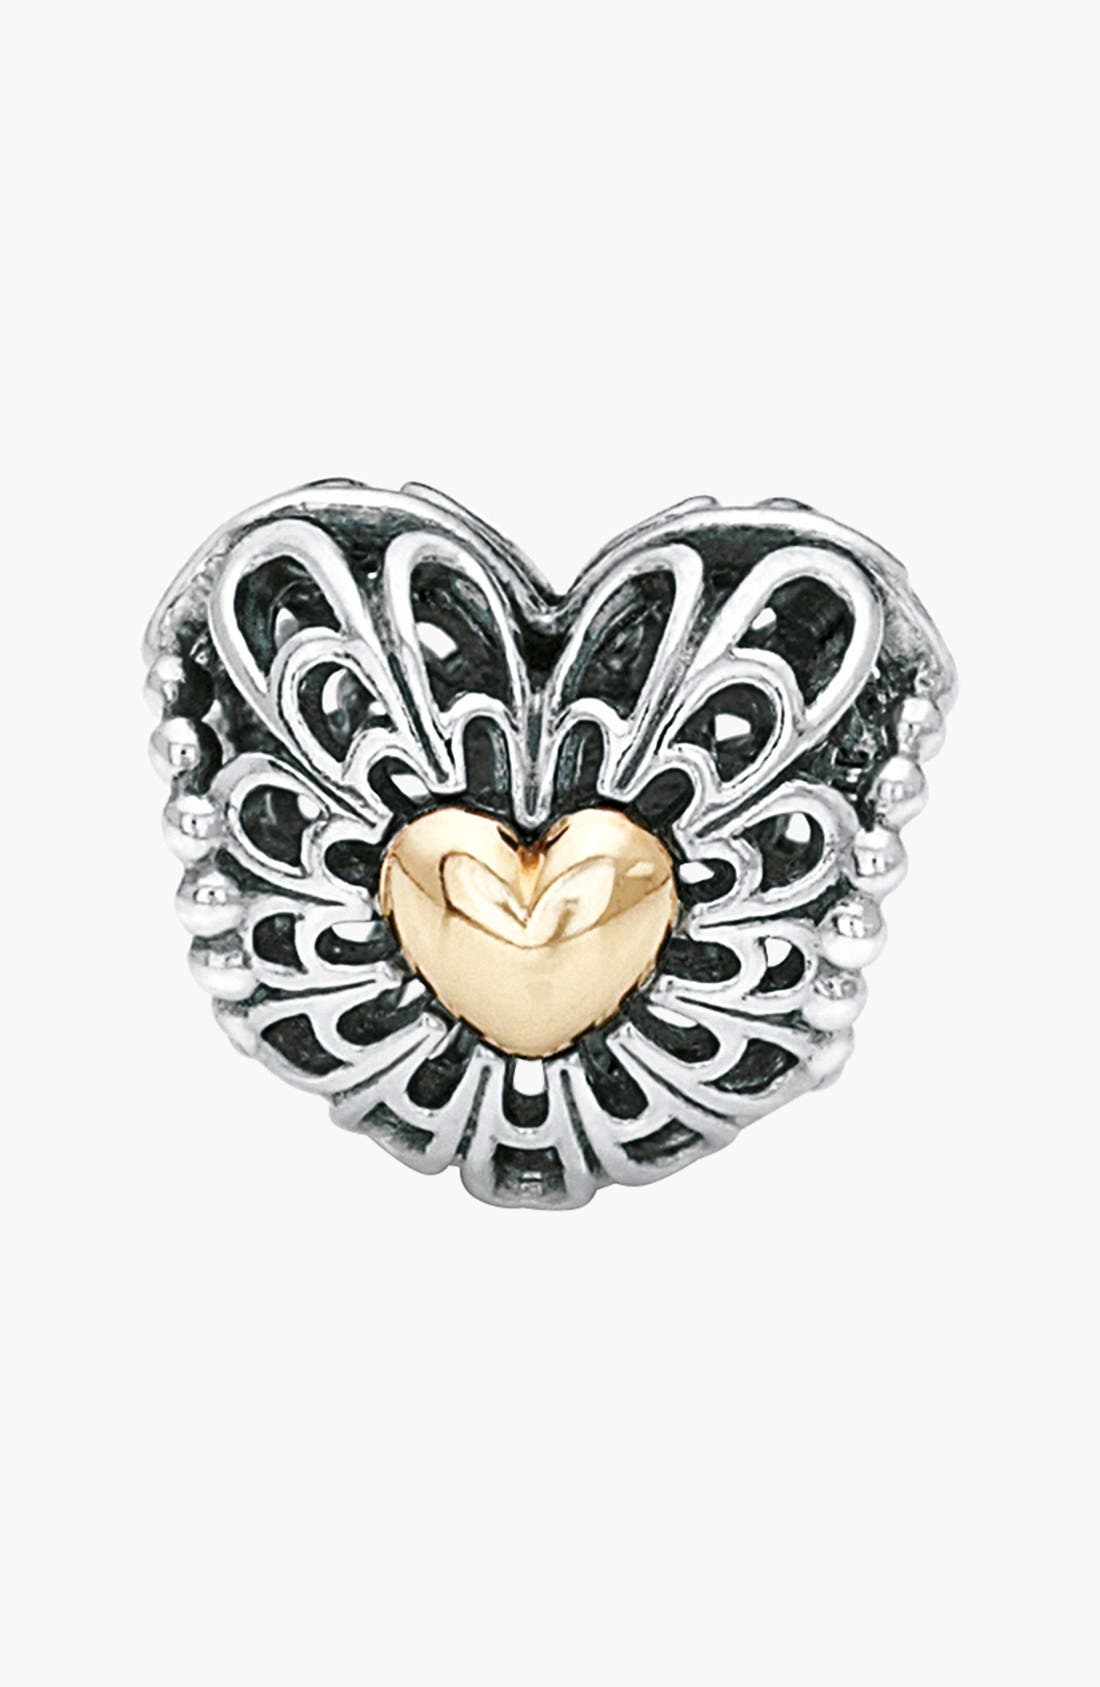 Alternate Image 1 Selected - PANDORA 'Vintage Heart' Two-Tone Bead Charm